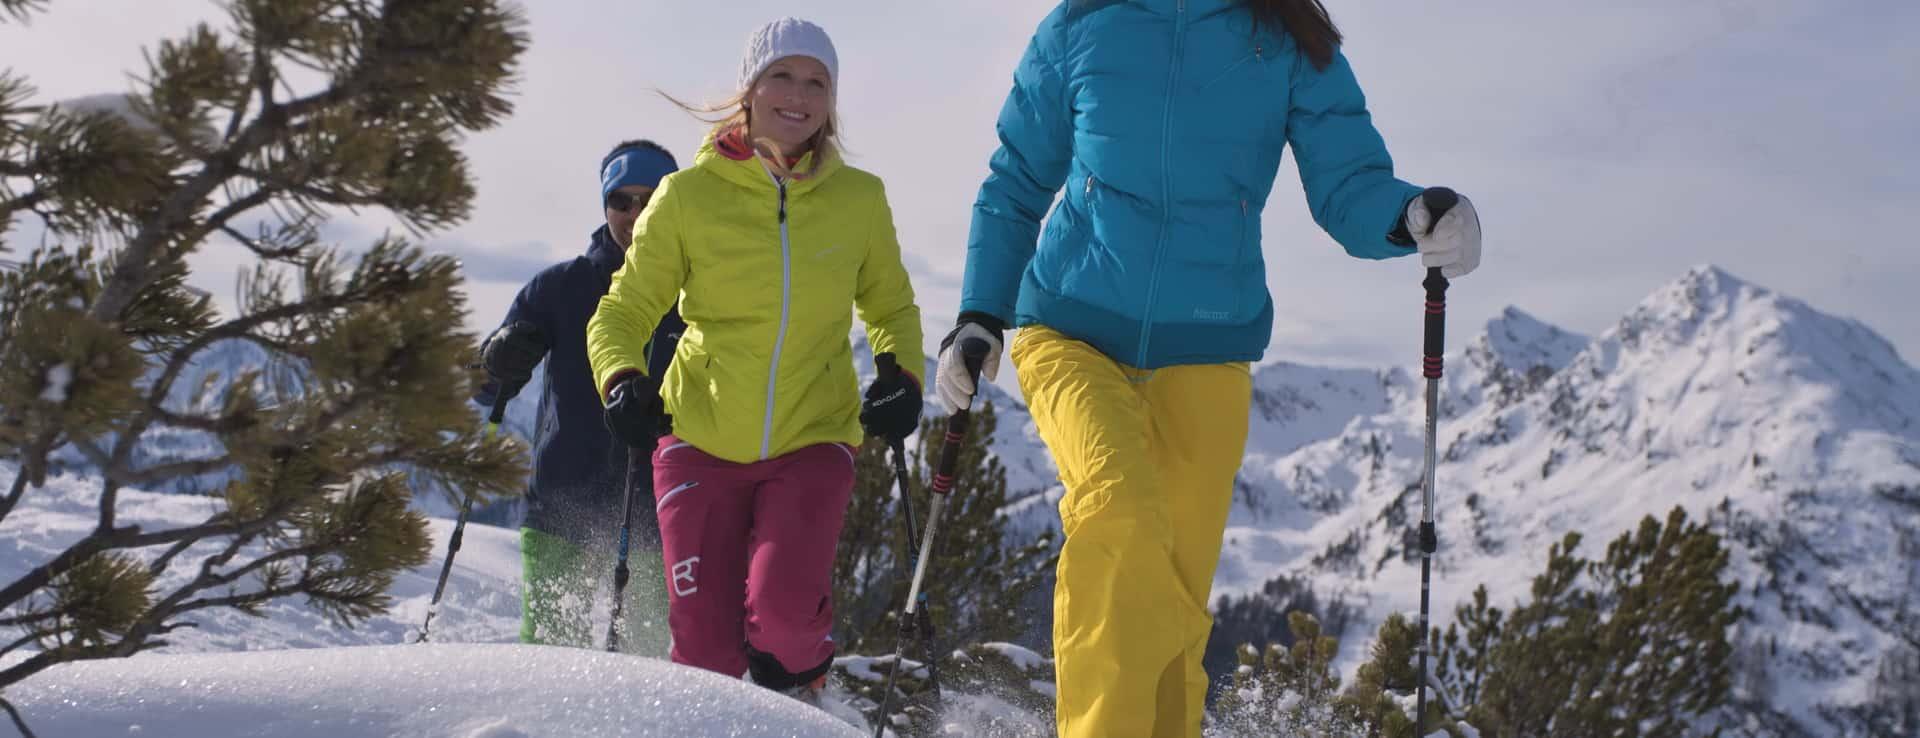 Snöskovandring Schladming Dachstein Semester i Alperna